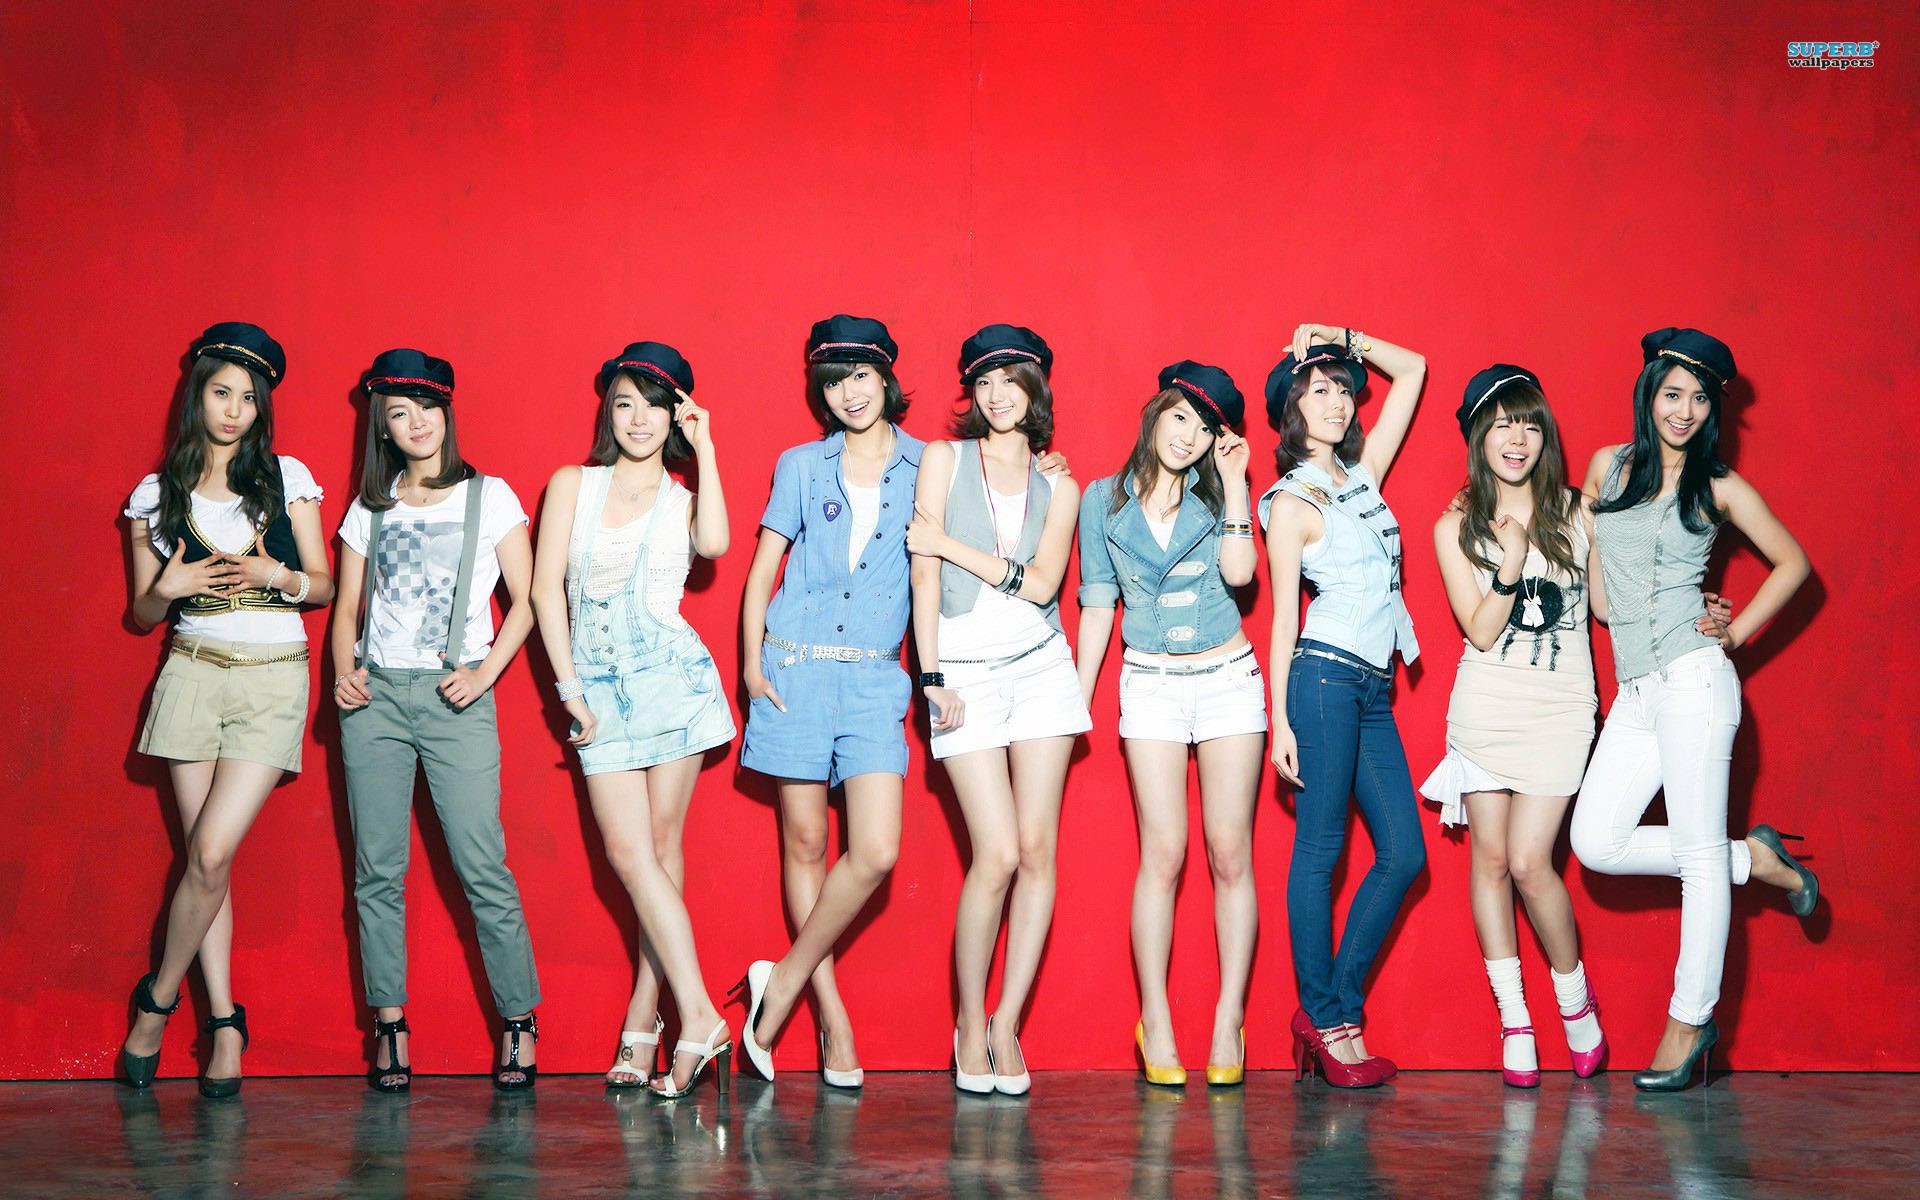 Girls Generation - Girls Generation/SNSD Wallpaper (32214673) - Fanpop